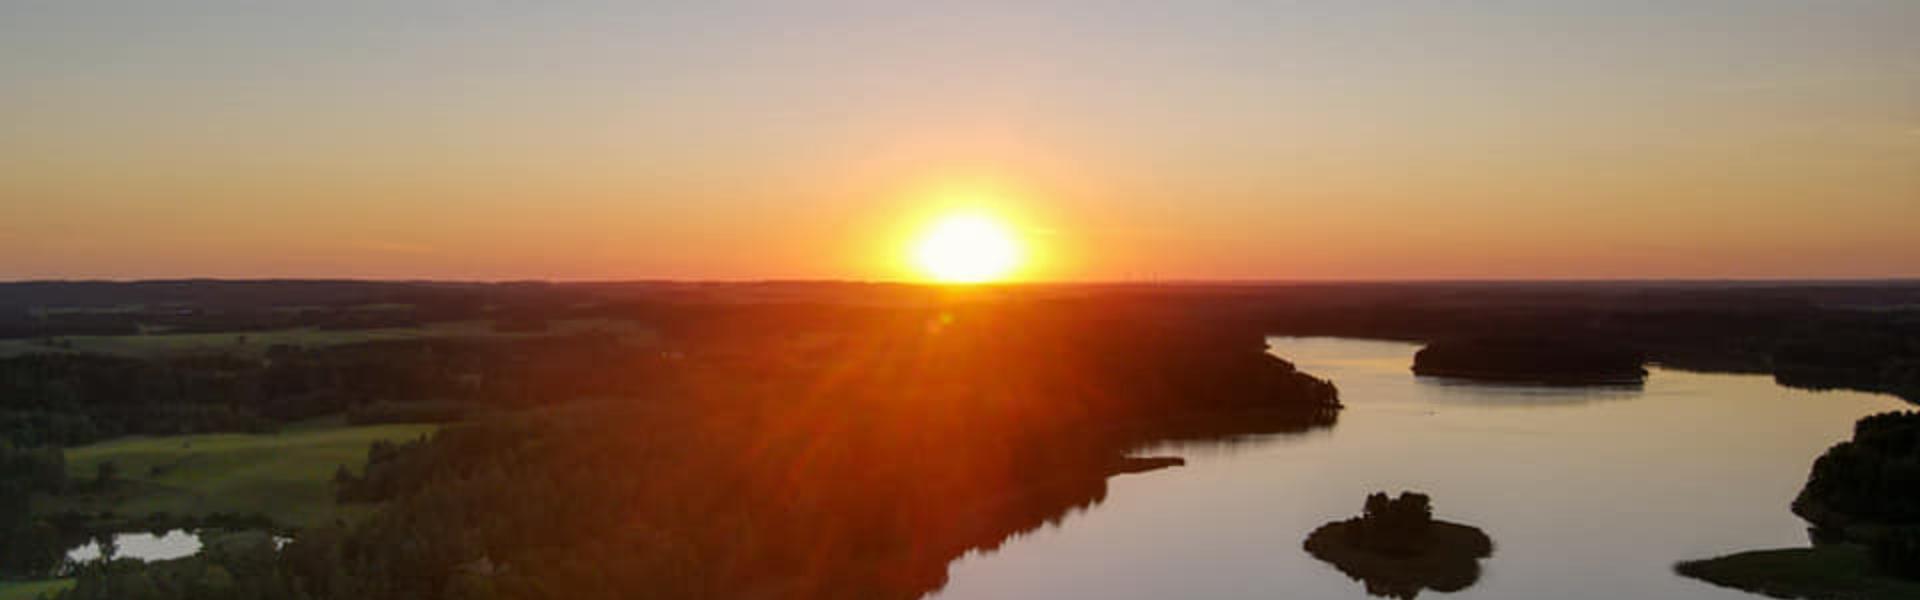 słońca zachód